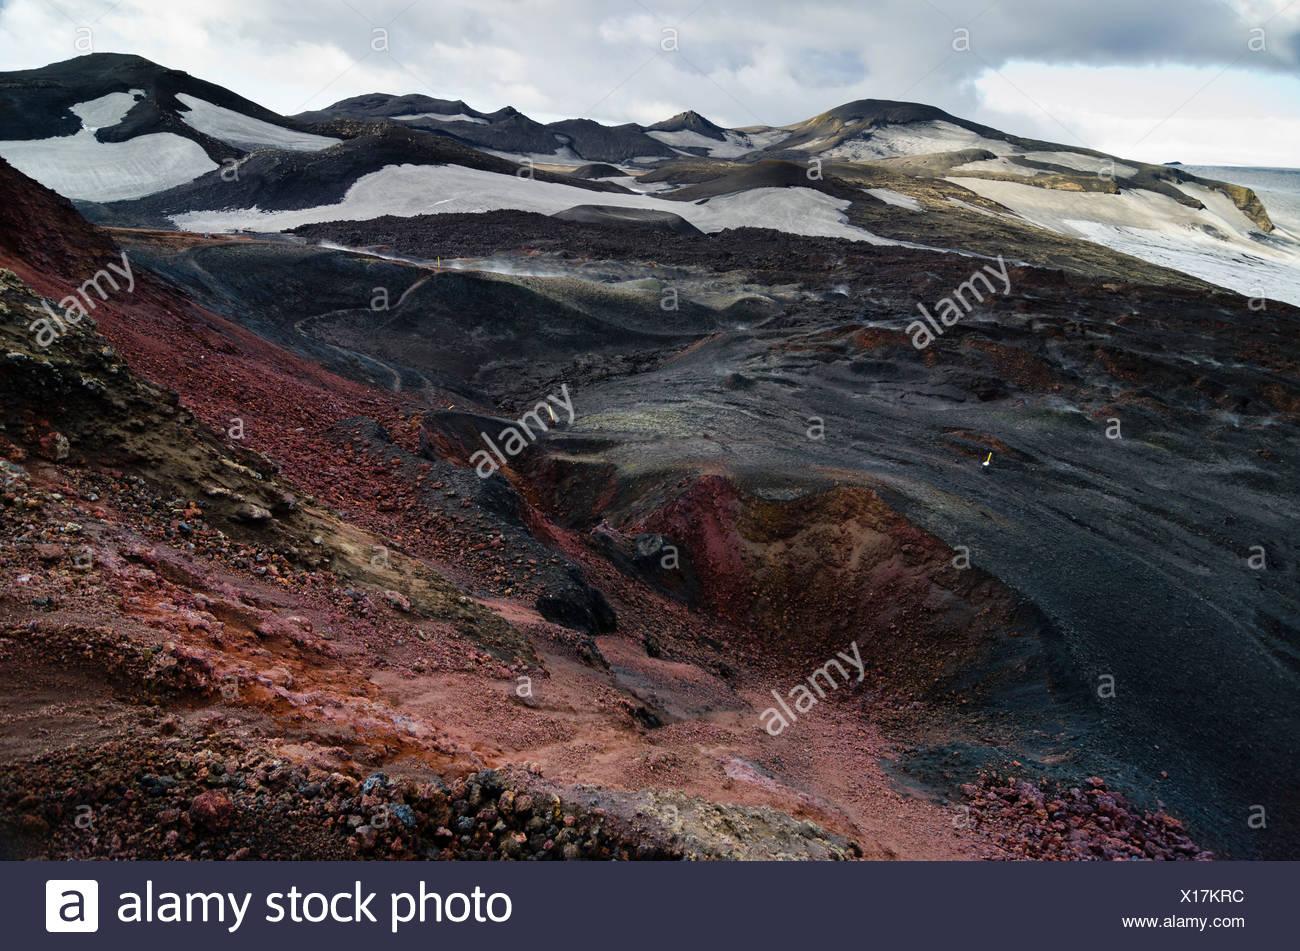 On Fimmvoerðuháls volcano, view of an extinct crater, hiking trail to the Fimmvoerðuháls, Fimmvoerduhals plateau, Suðurland - Stock Image